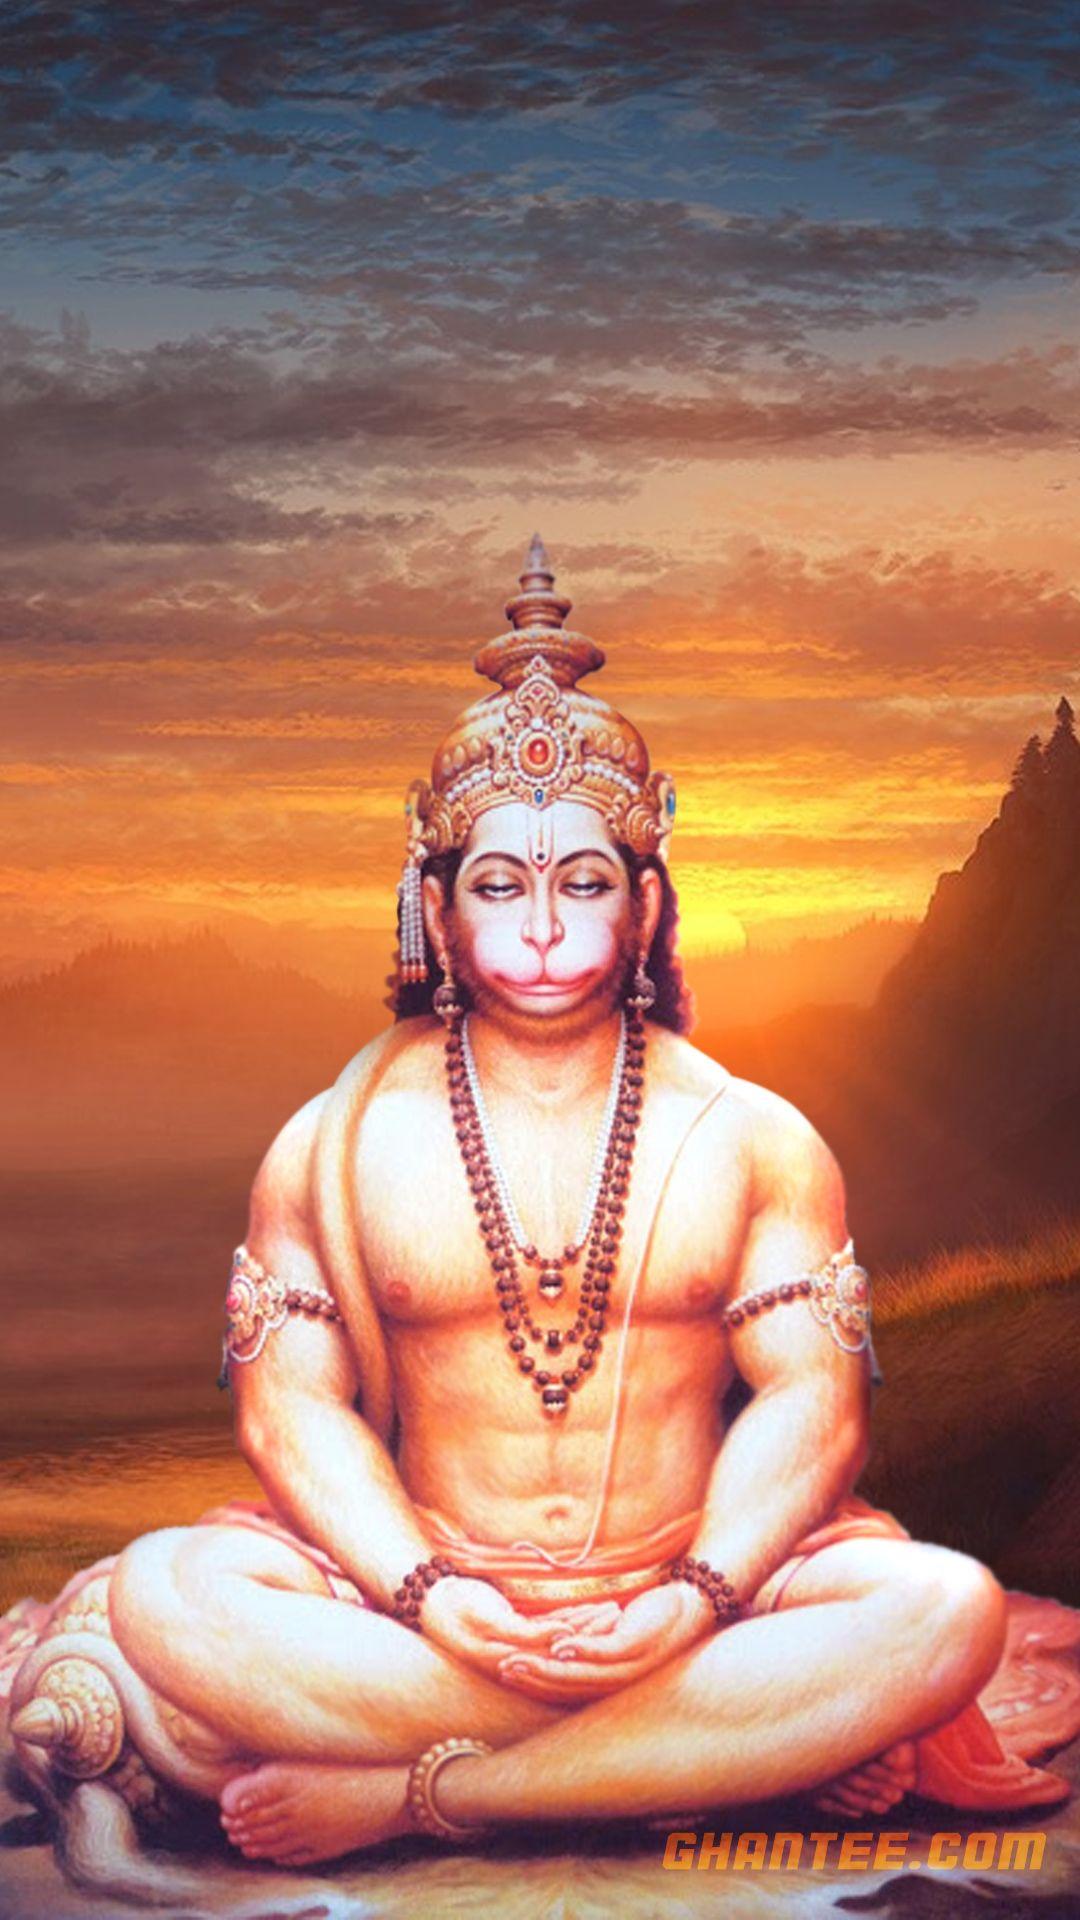 Lord Hanuman Wallpaper For Iphone Full Hd Ghantee In 2021 Lord Hanuman Wallpapers Hanuman Wallpaper Hanuman Ji Wallpapers Wallpaper full hd hd 1080p lord hanuman